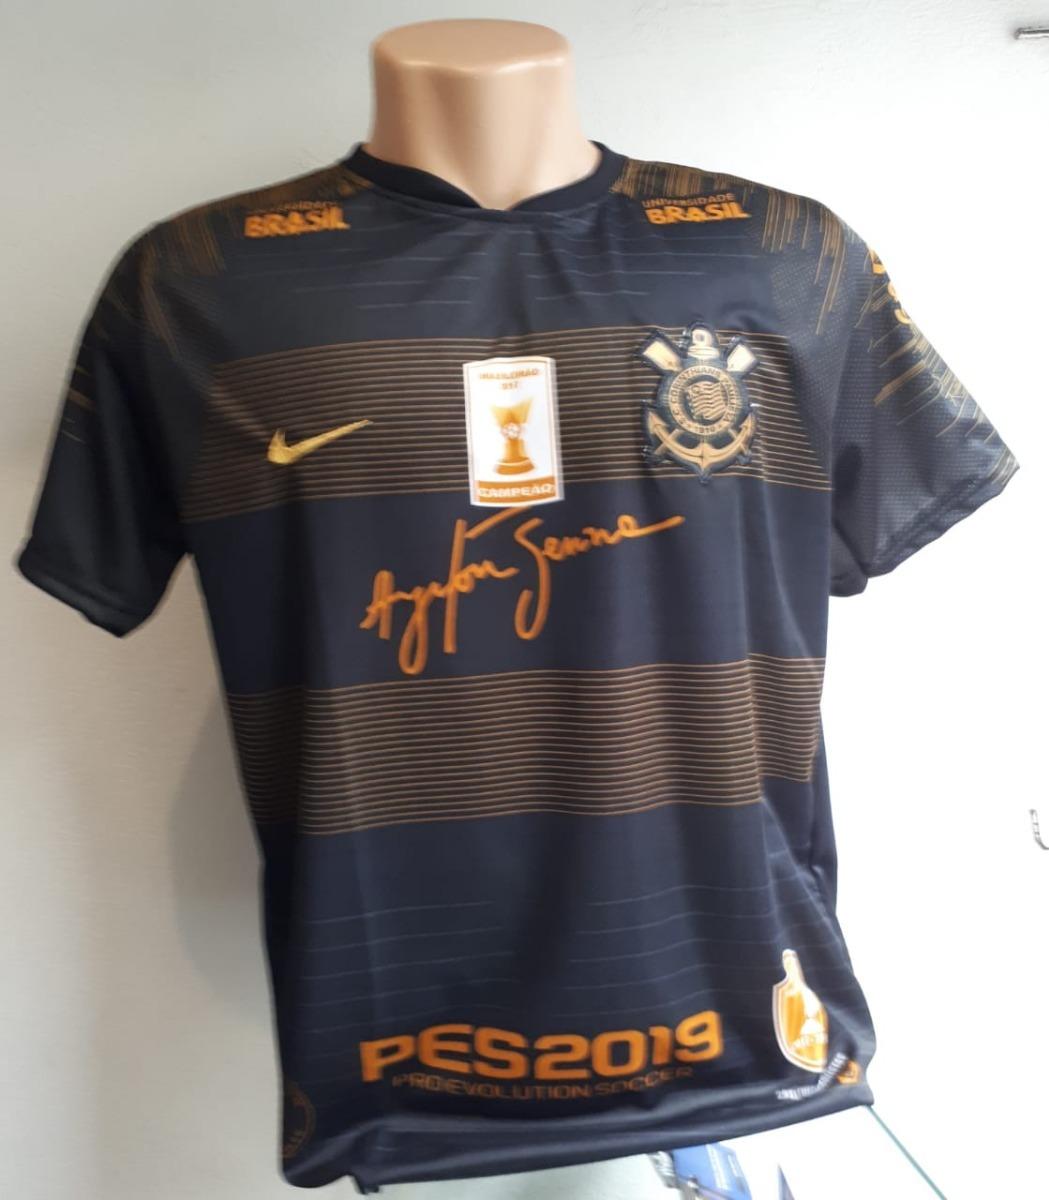 Camisa Blusa Camiseta Time Futebol Corinthians Masculino - R  29 54c9b942f313b